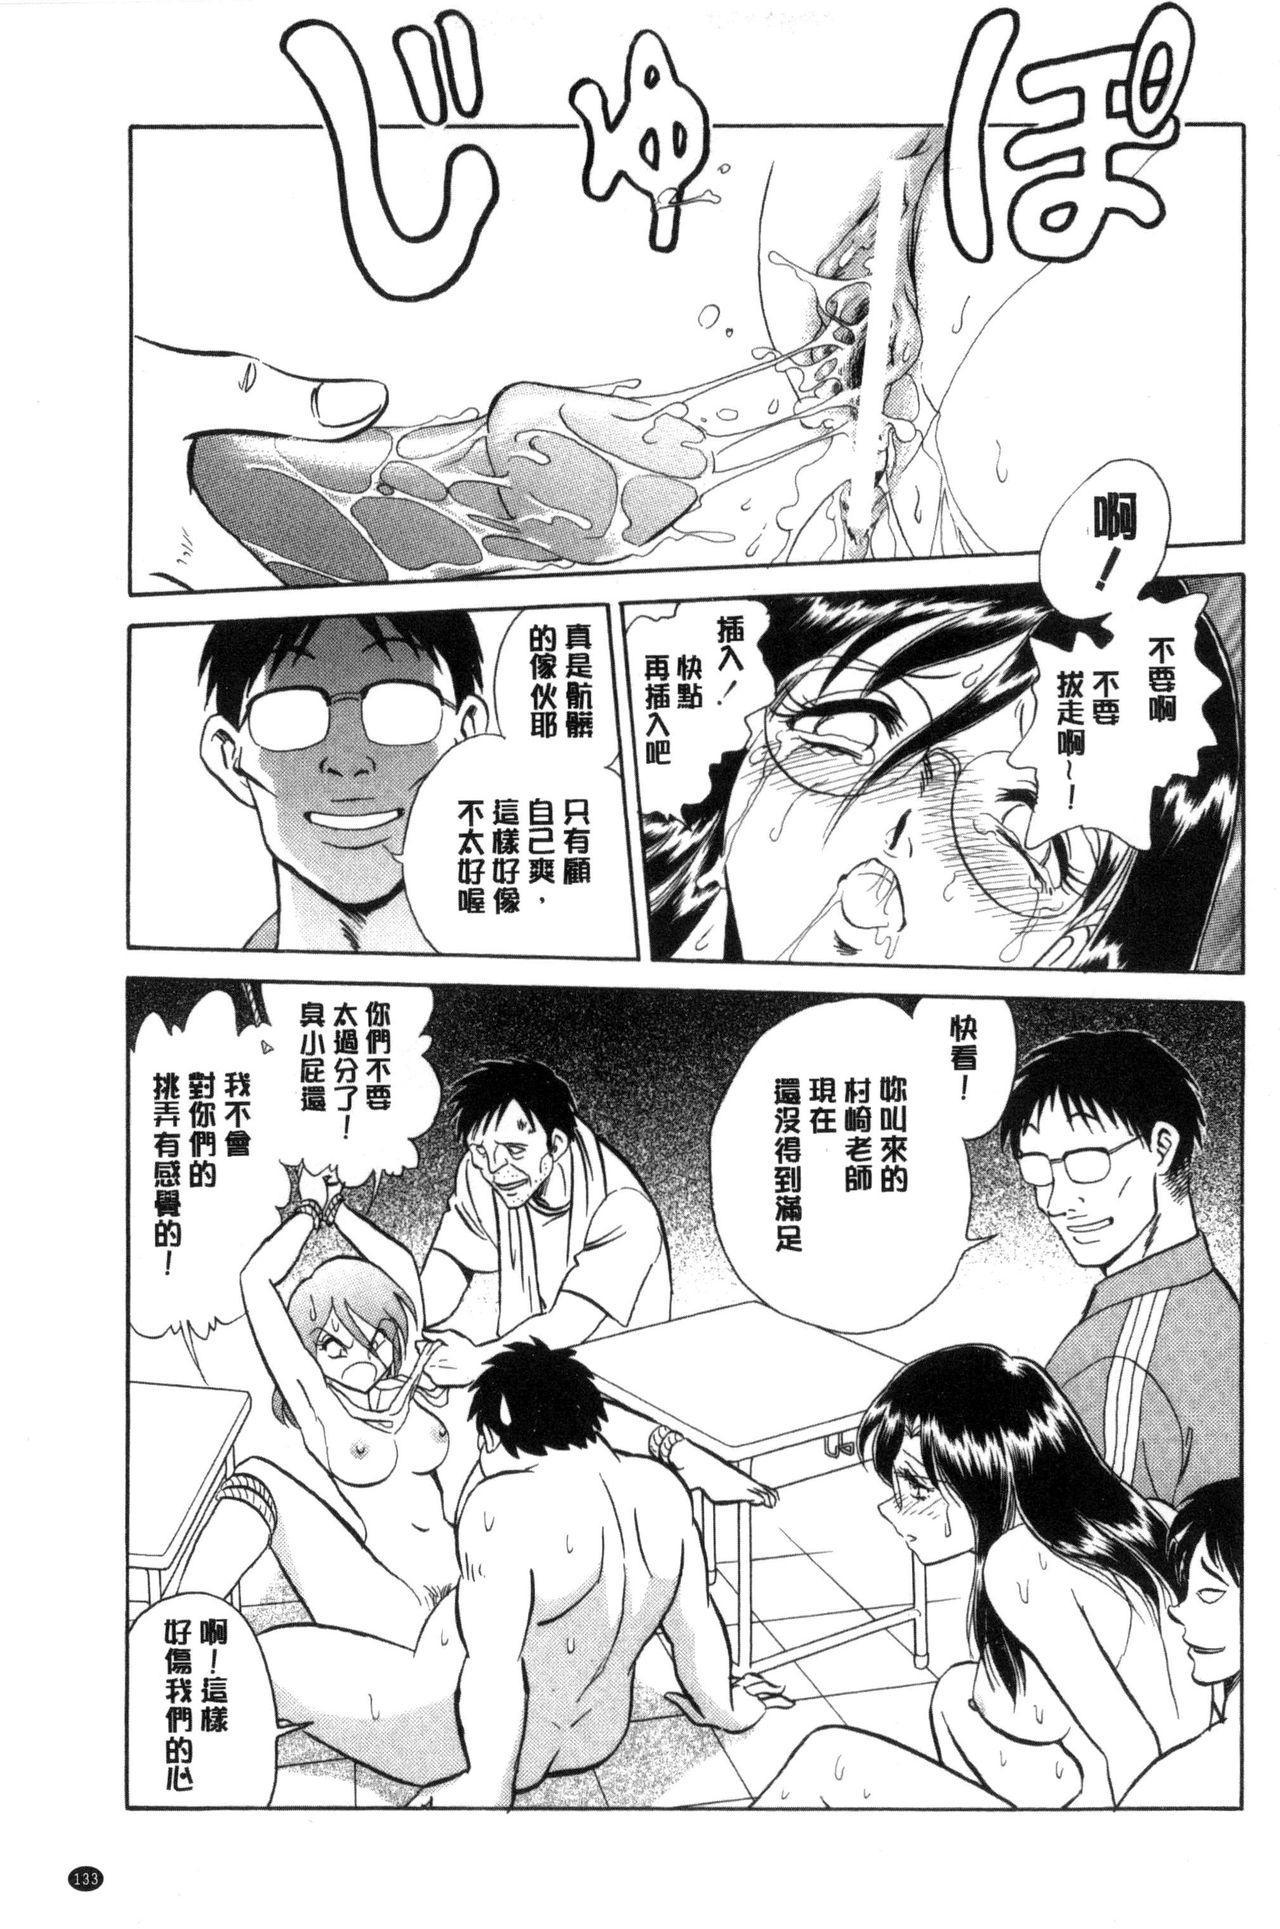 Hazukashii Kagai Jugyou | 害羞的課外授業 133